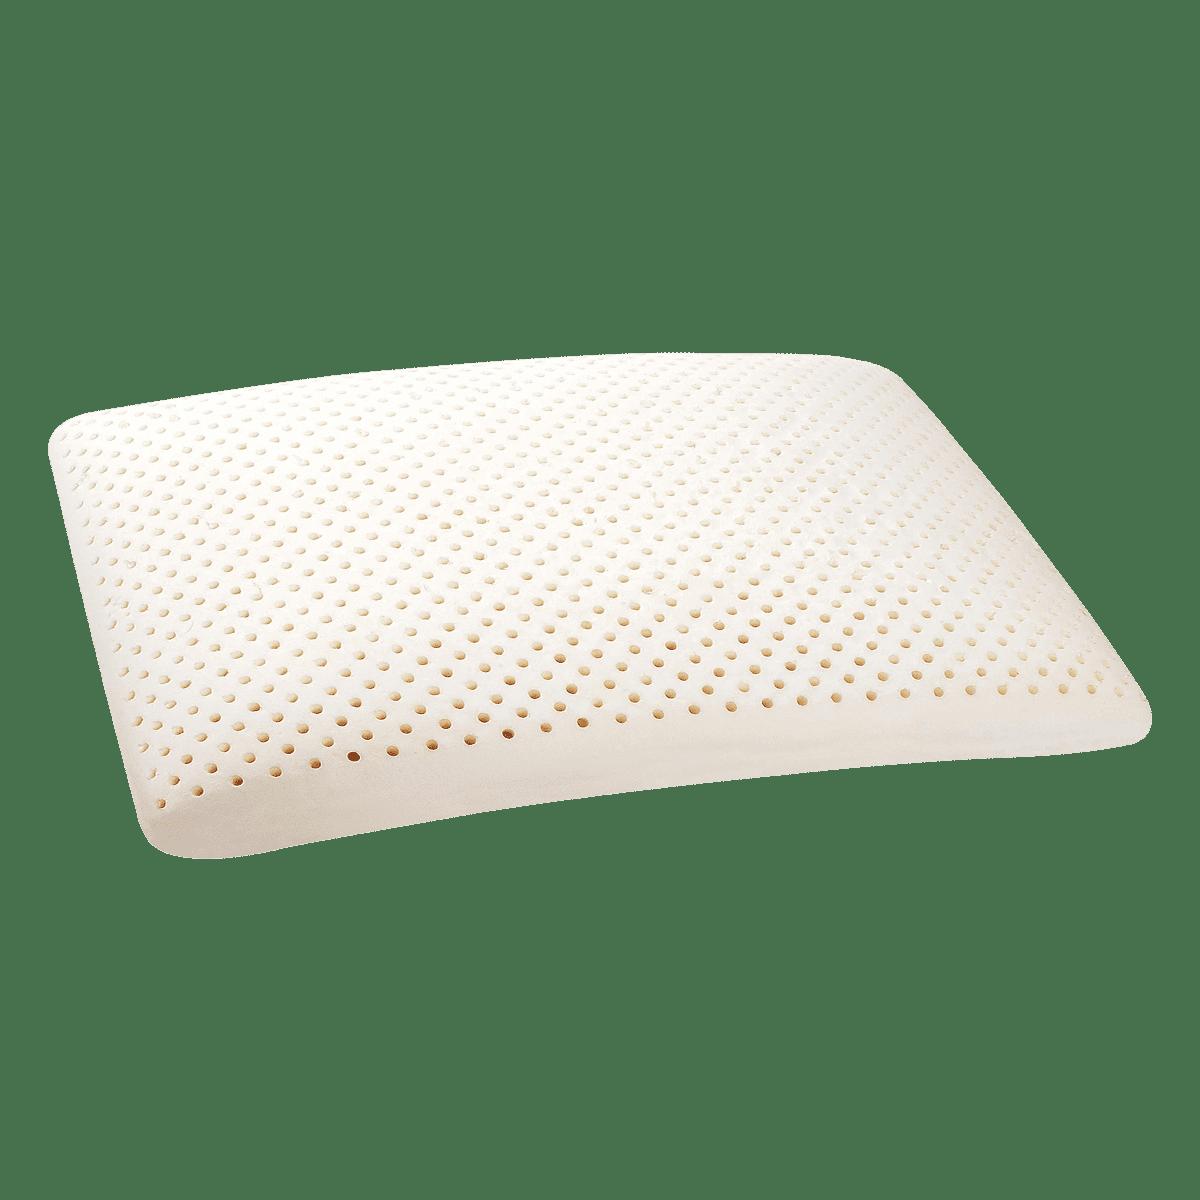 Travesseiro Duoflex Natural Látex 50x70x14